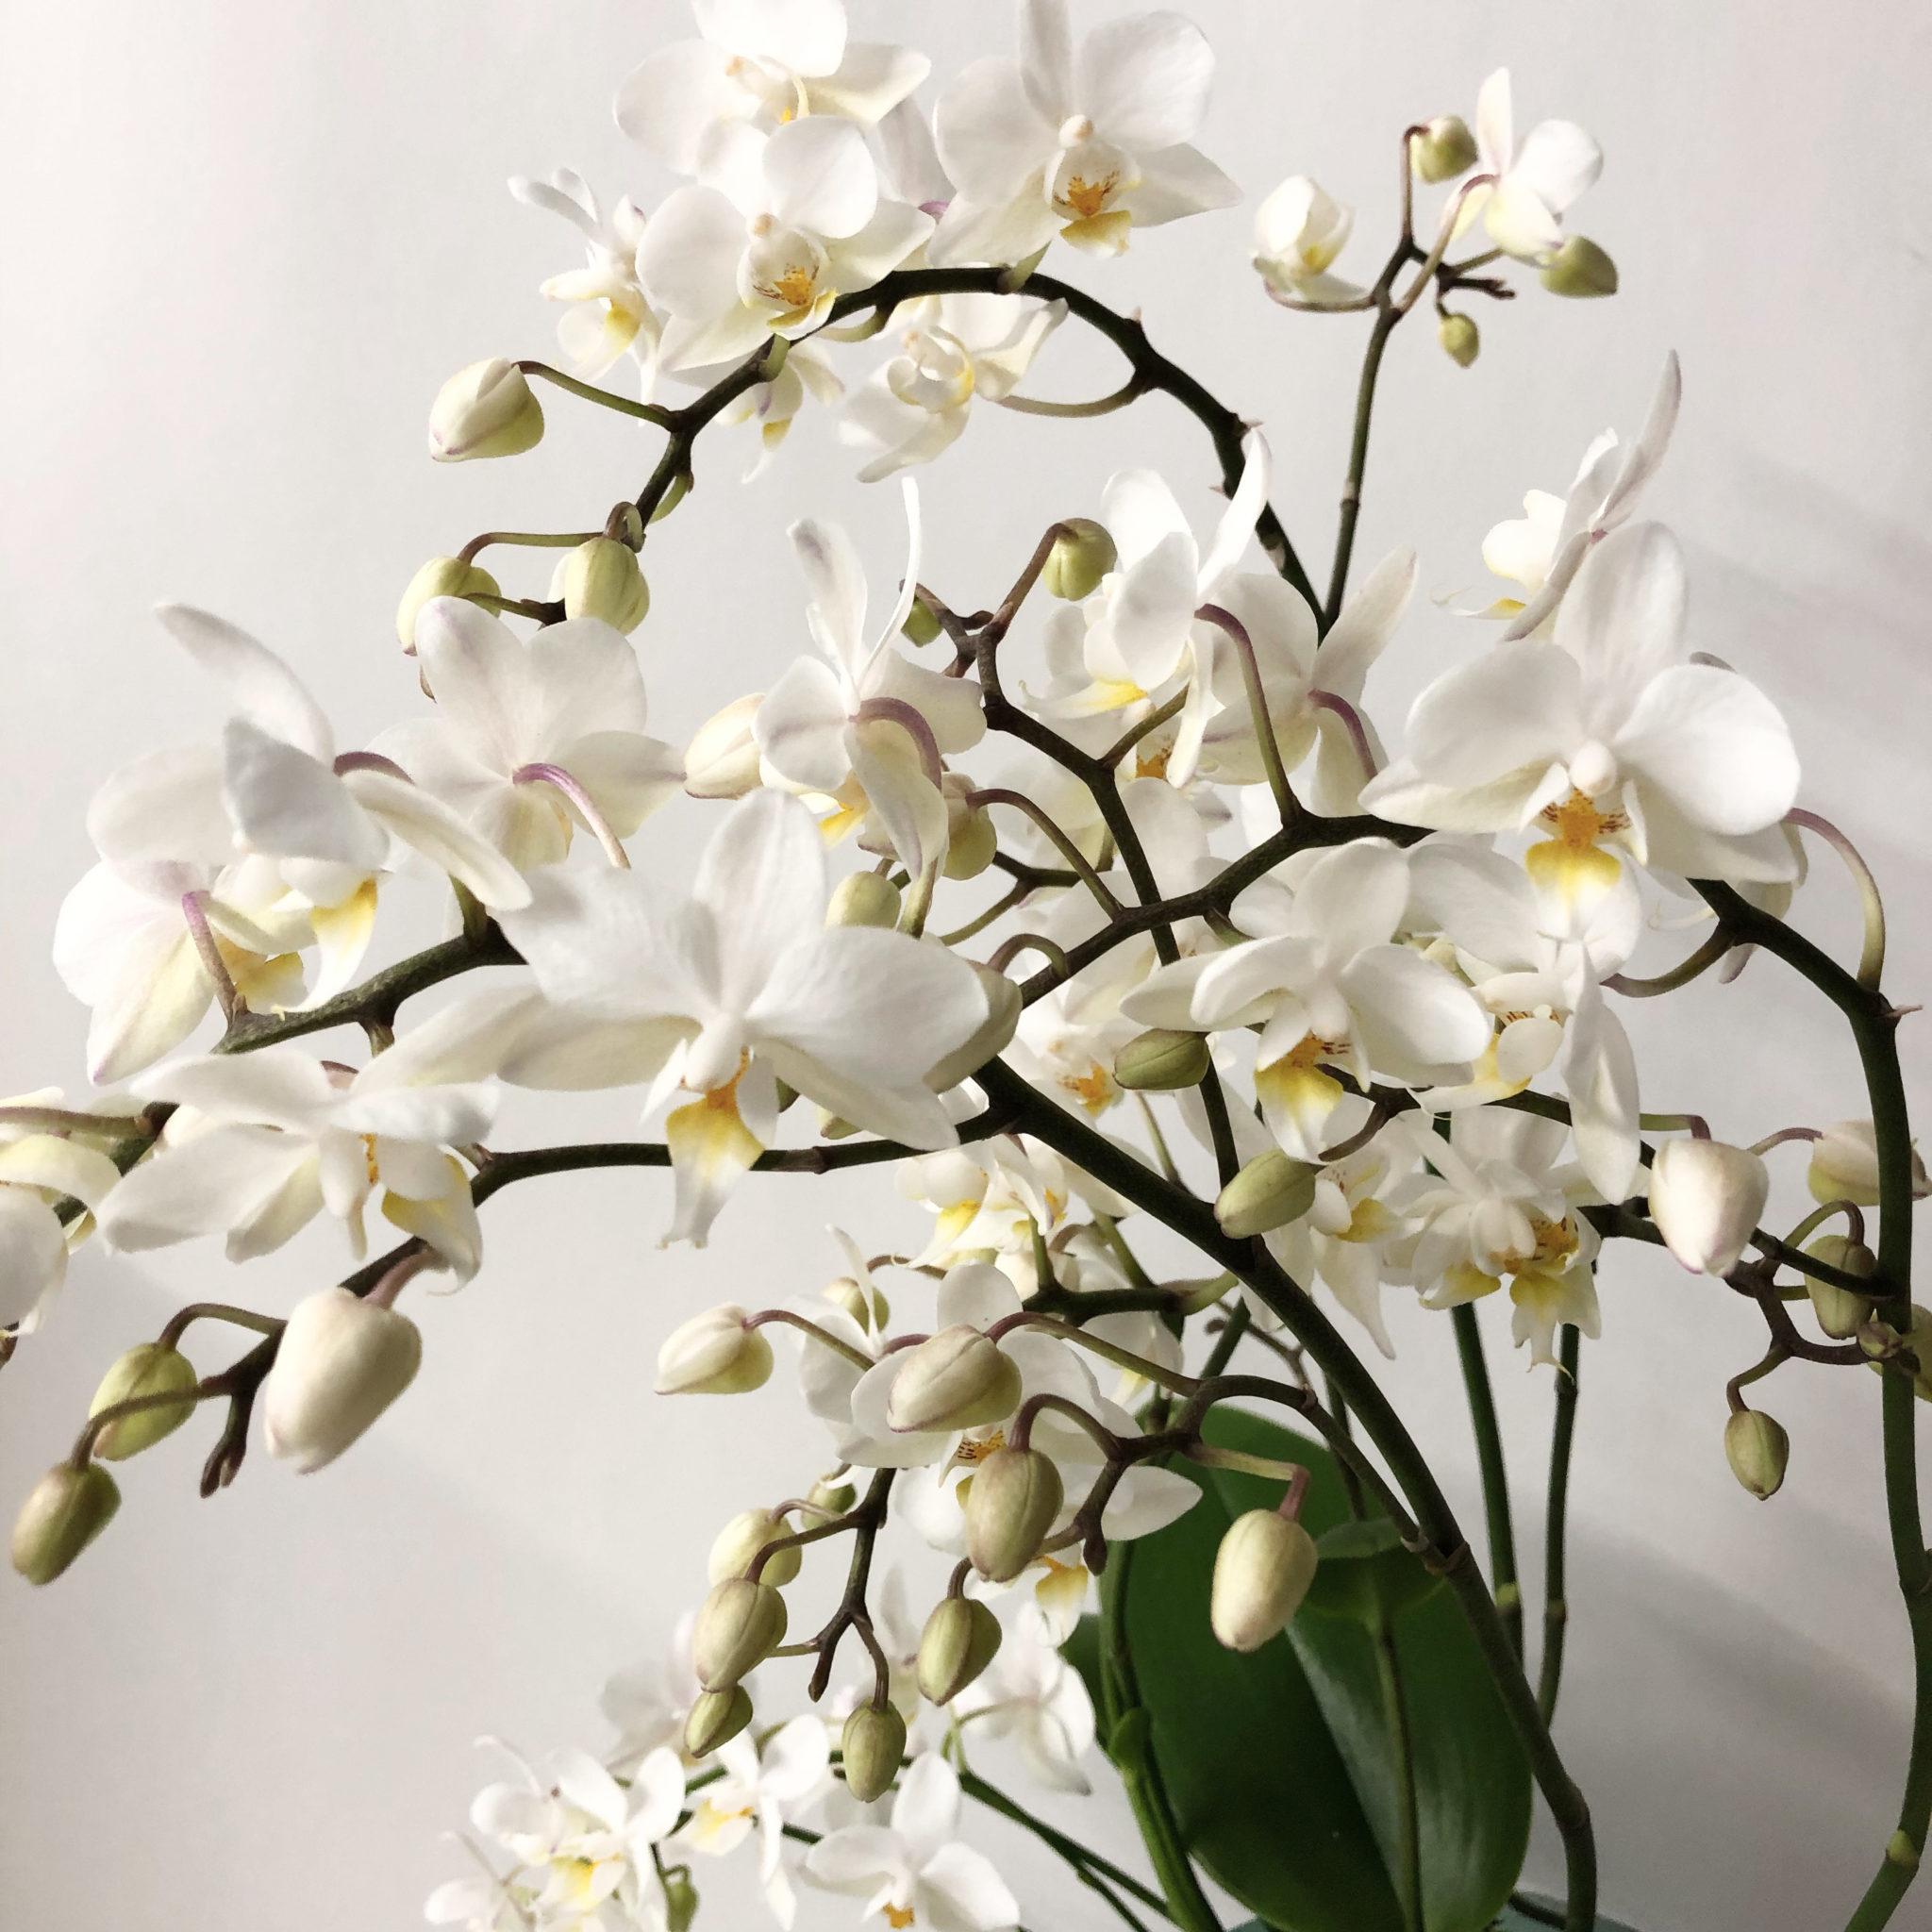 orchid e blanche plante tropicale l gante et raffin e. Black Bedroom Furniture Sets. Home Design Ideas